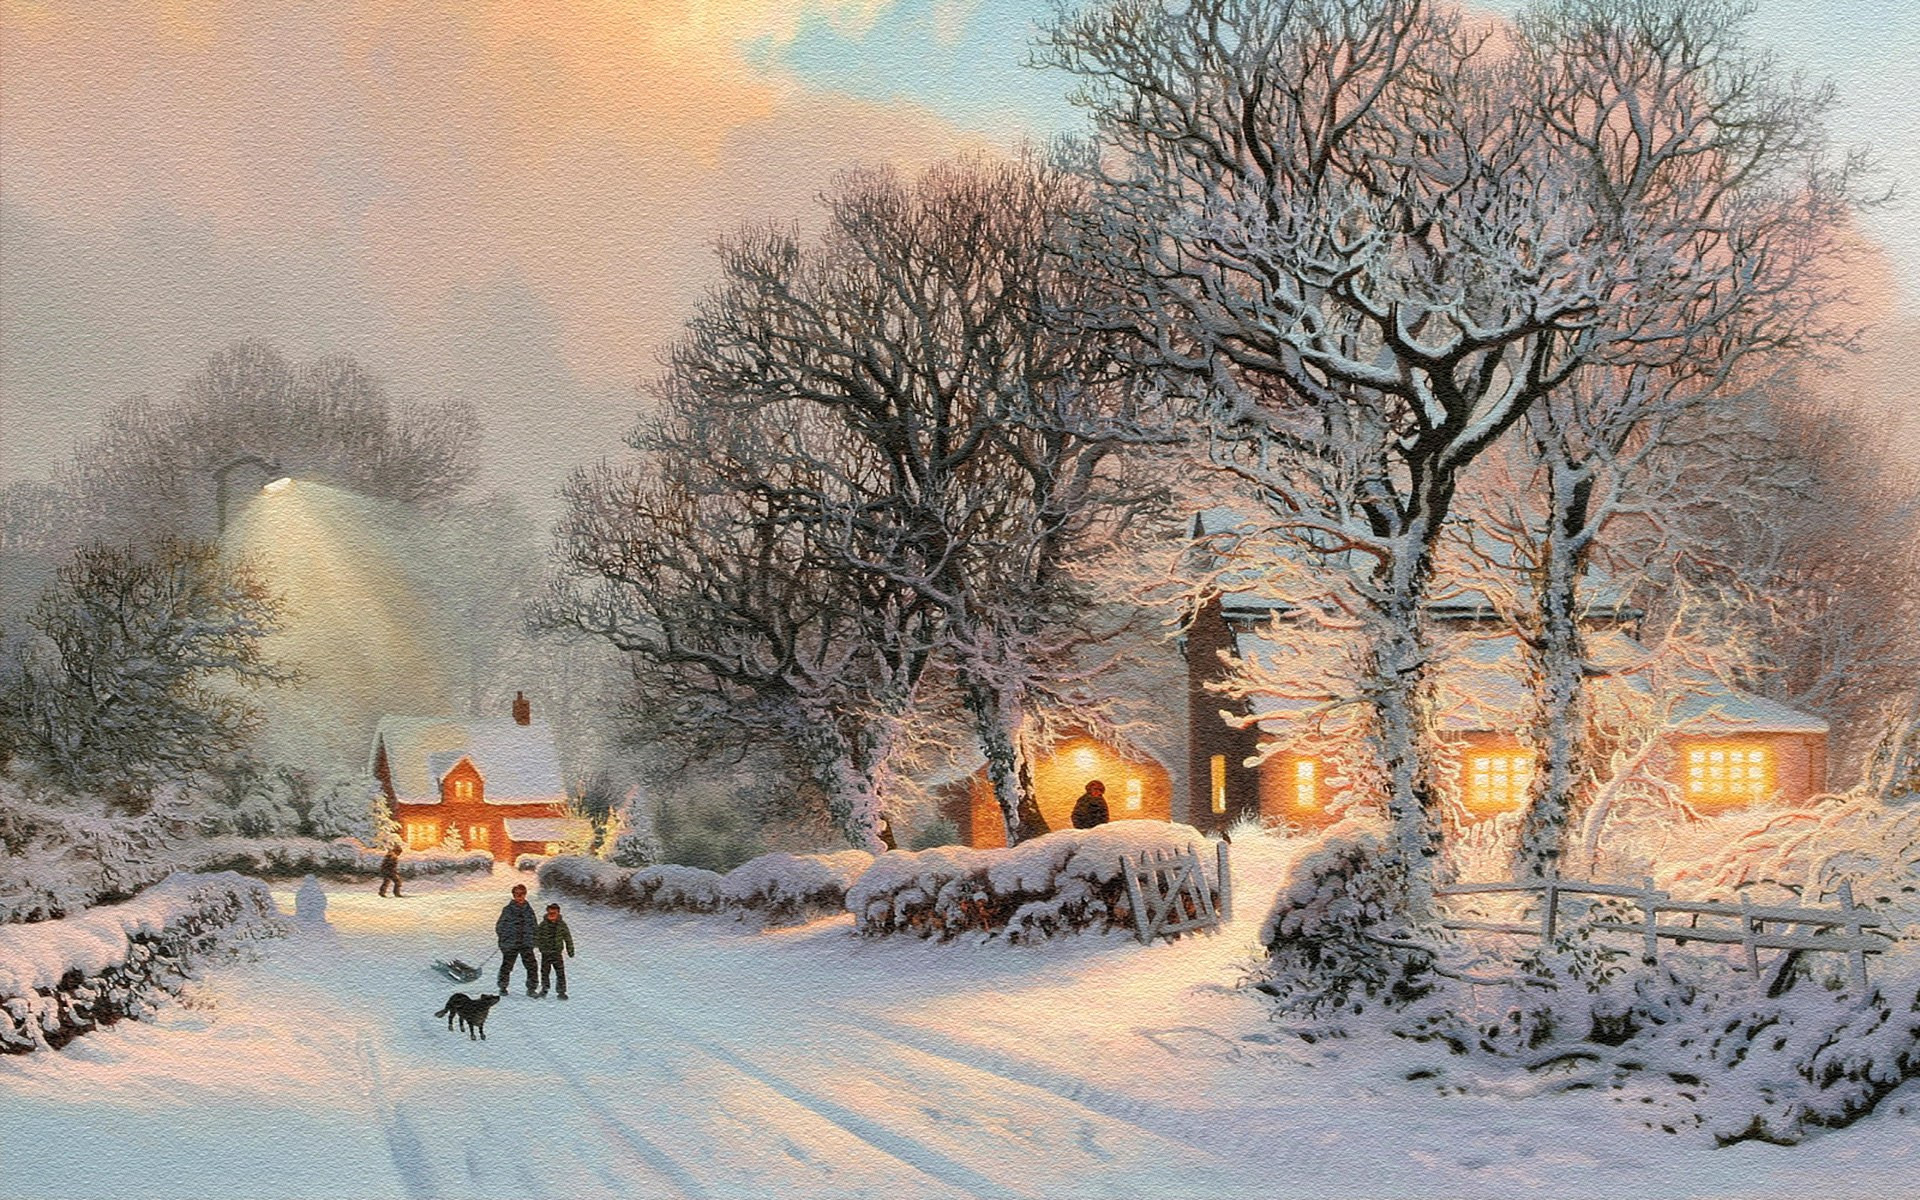 Sfondi Natalizi Innevati.Sfondi Neve 50 Immagini